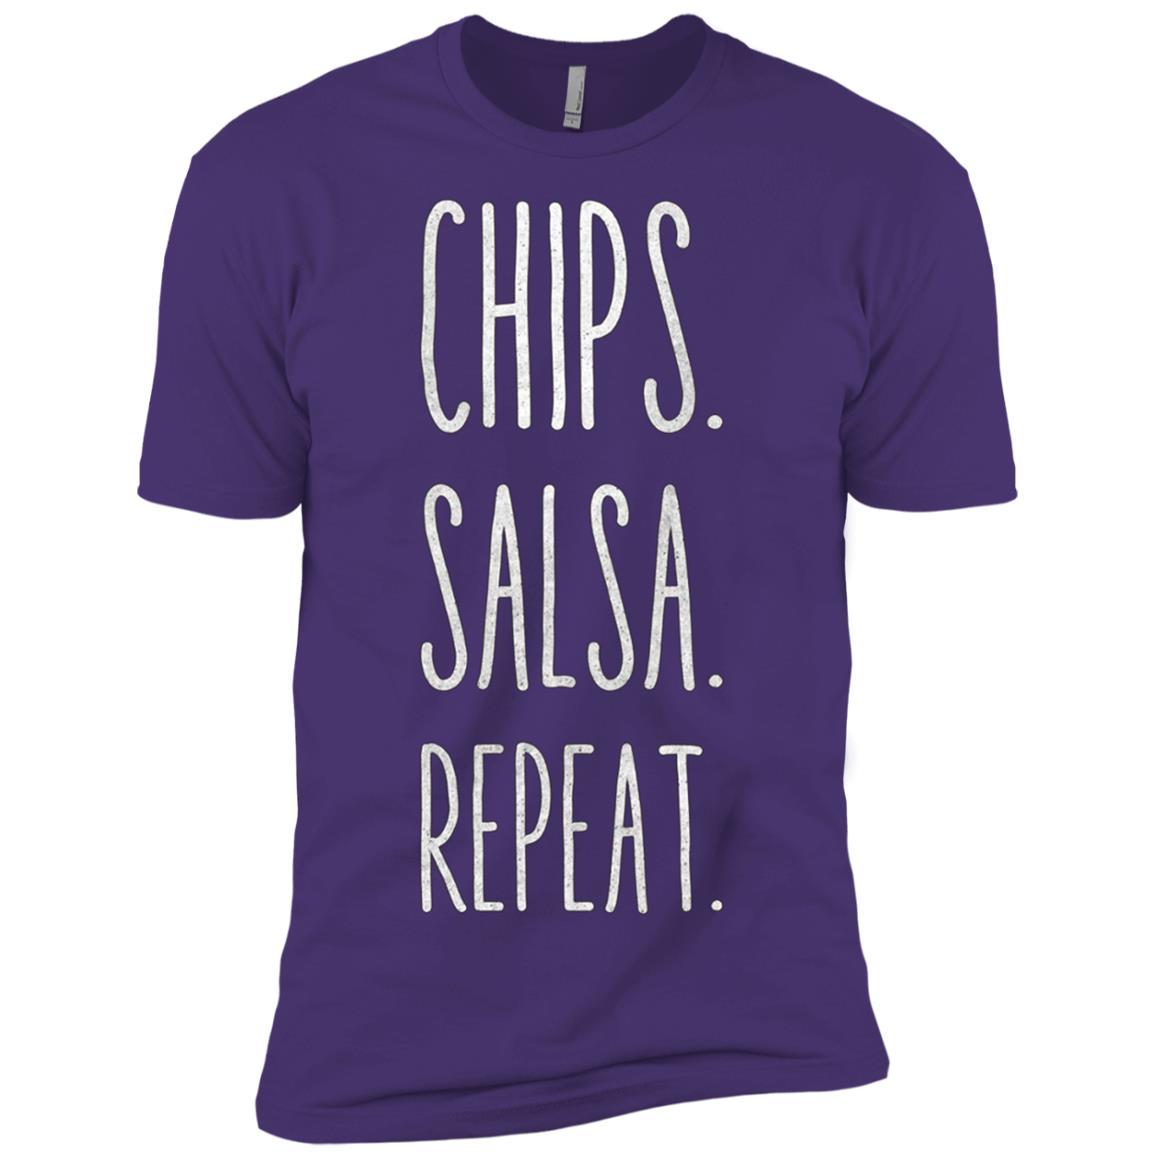 Chips. Salsa. Repeat. Funny Men Short Sleeve T-Shirt